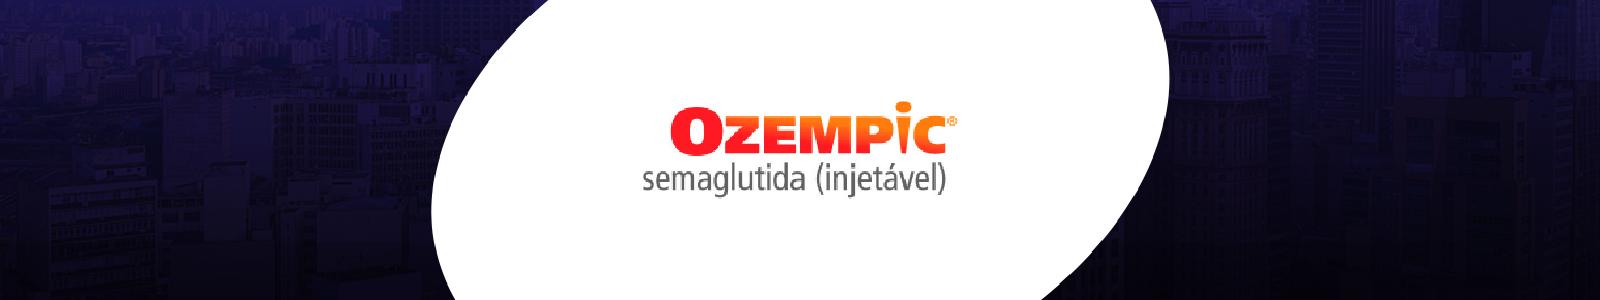 banner-novonordisk-ozempic